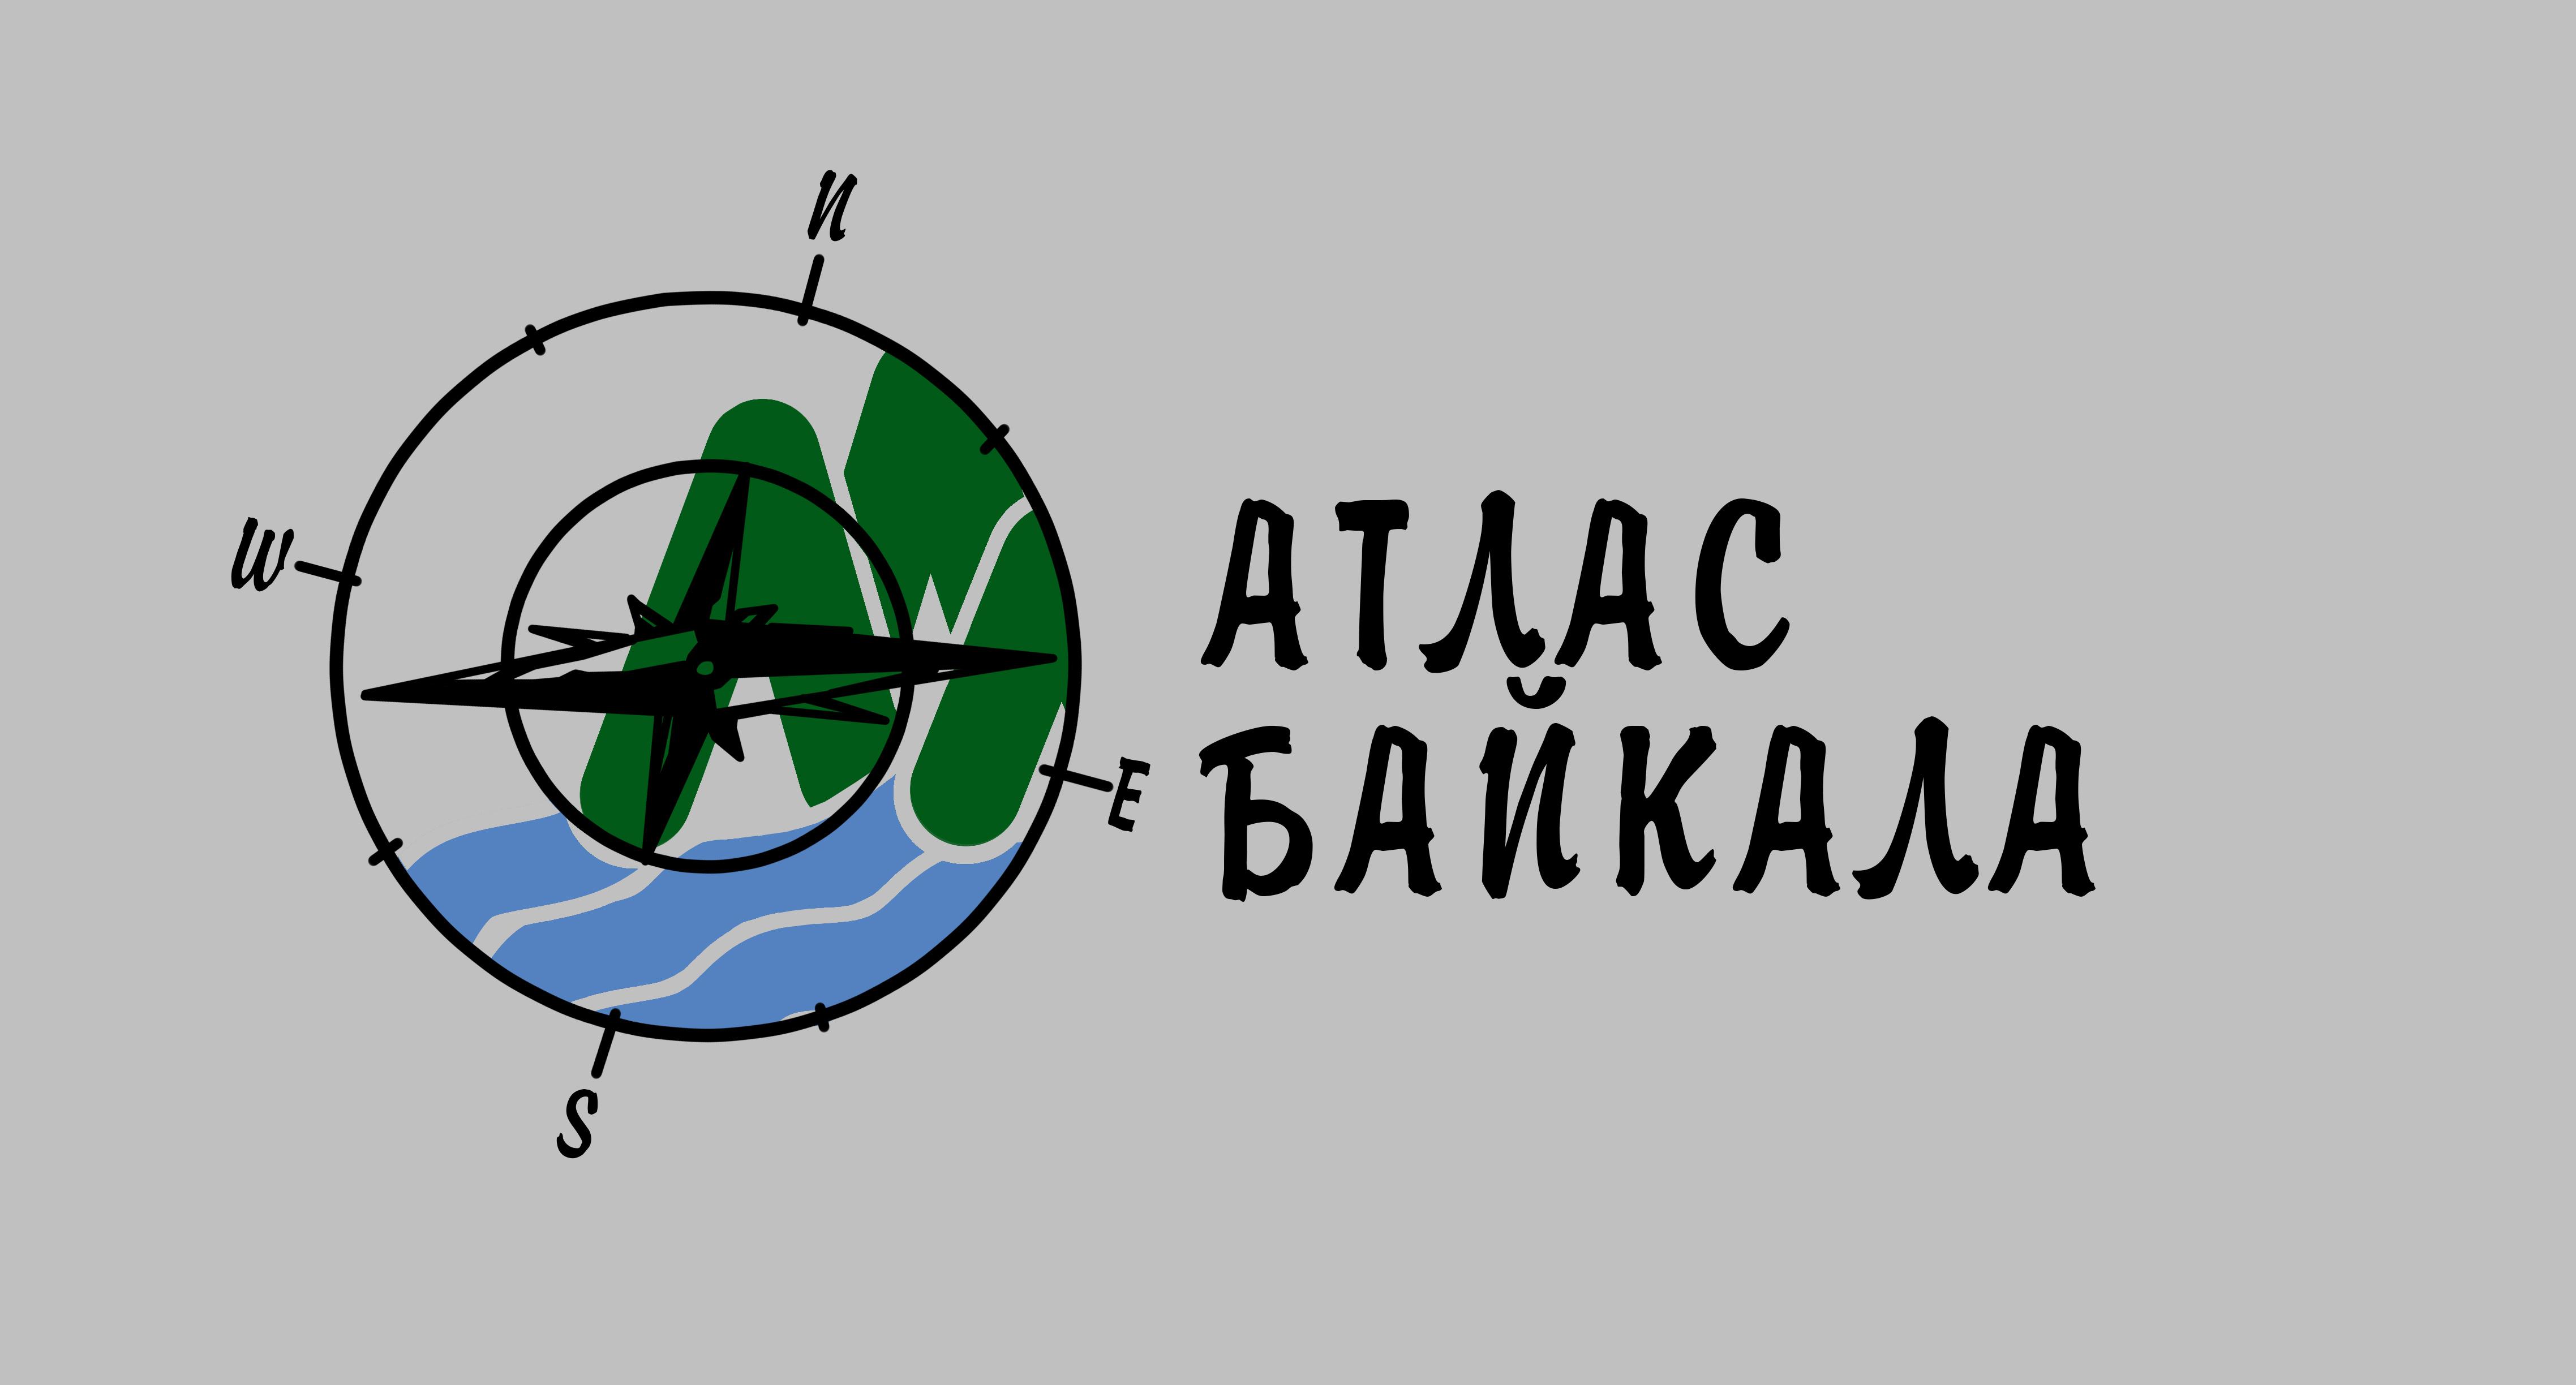 Разработка логотипа Атлас Байкала фото f_1085afc59967e6cc.jpg